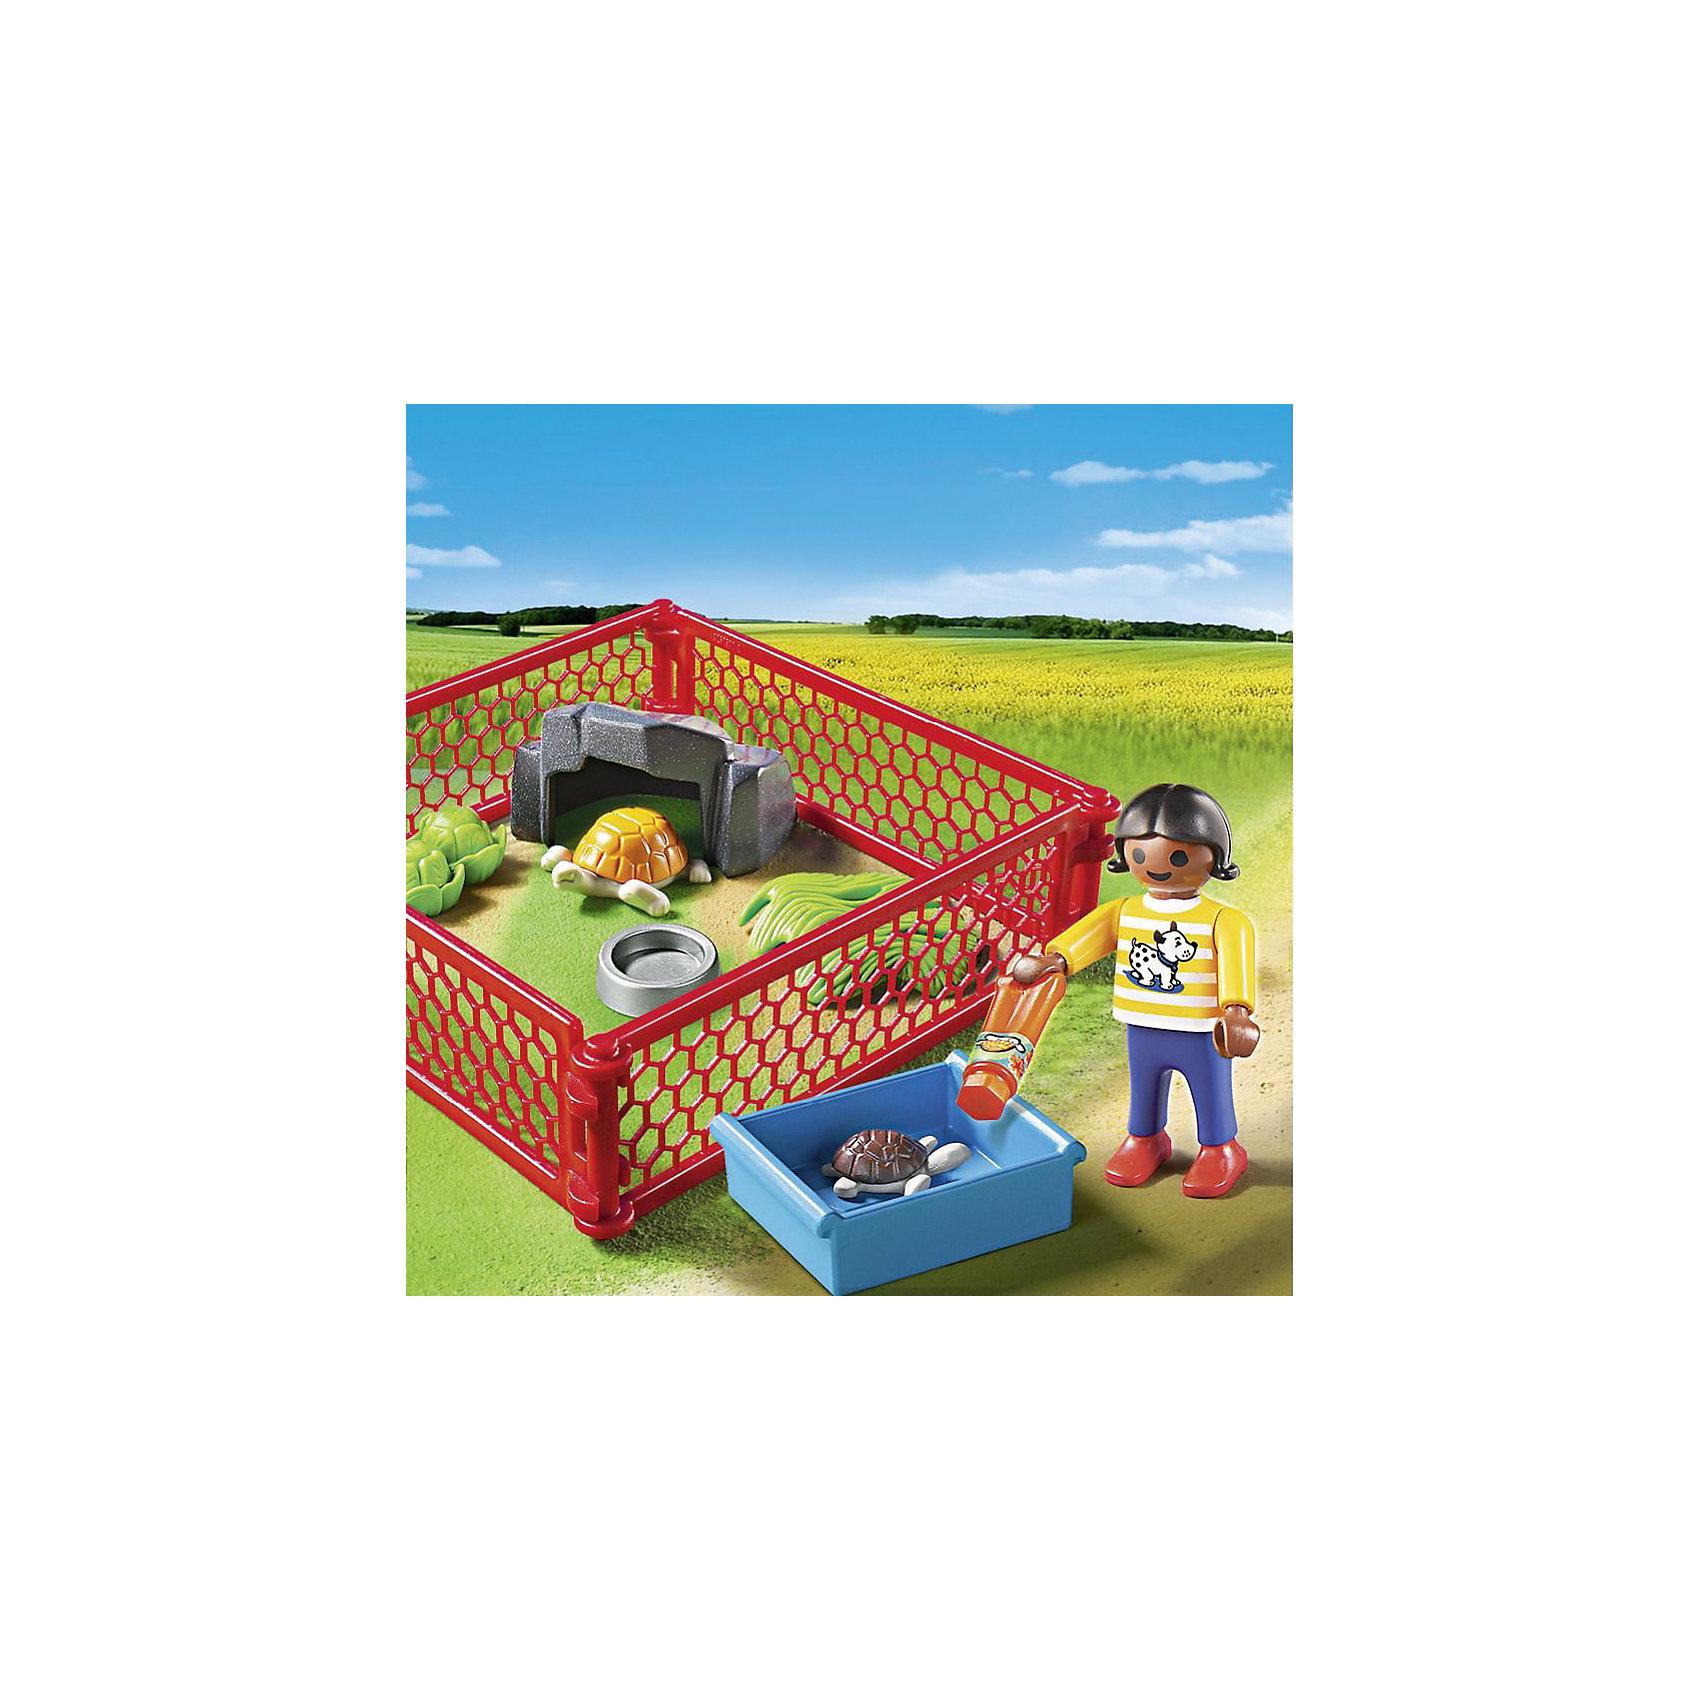 PLAYMOBIL® PLAYMOBIL 5534 Ветеринарная клиника: Загон для черепах playmobil® детская клиника рентгеновский кабинет playmobil